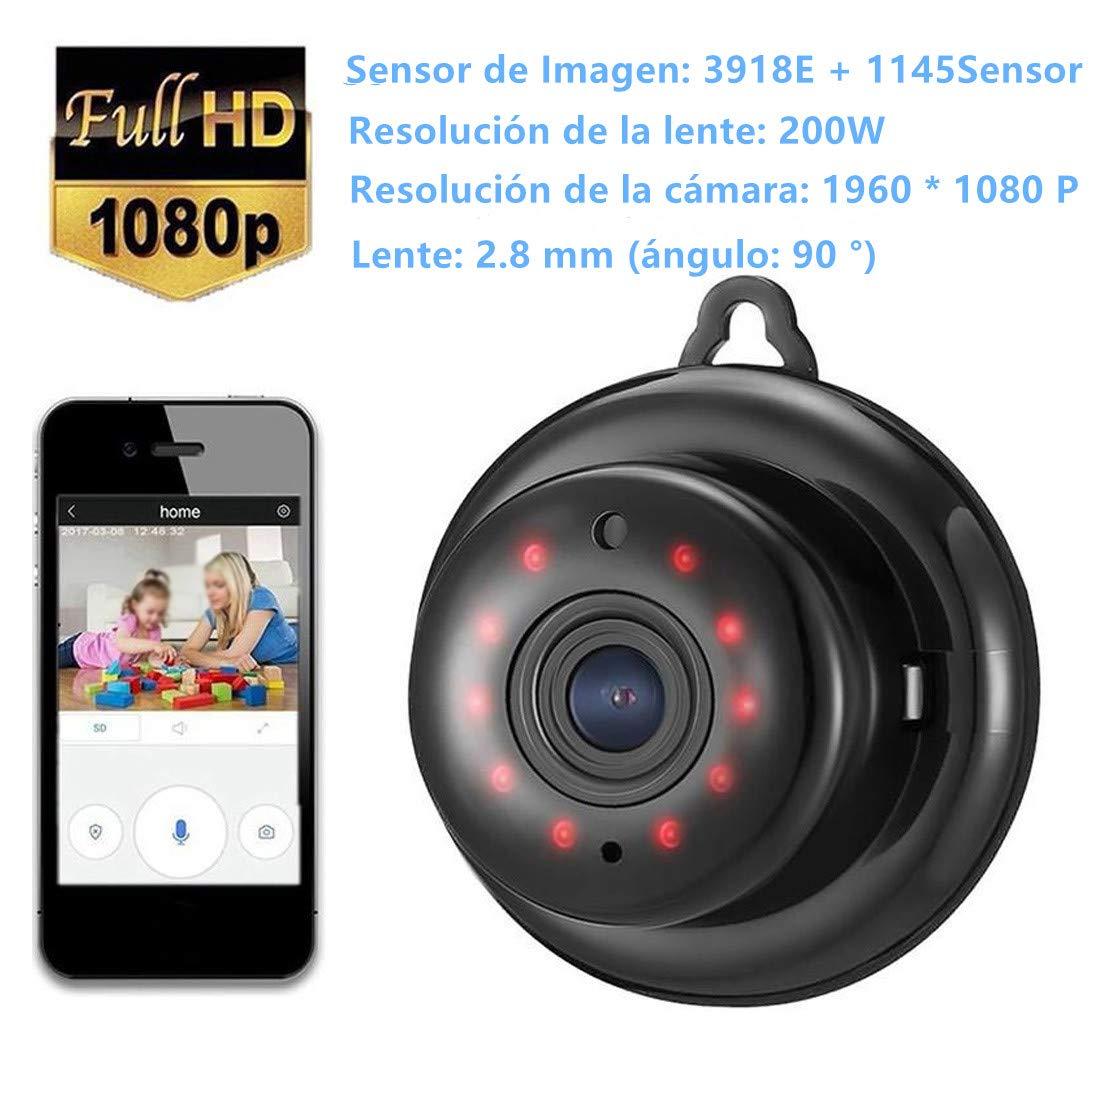 Cámaras de Vigilancia Cámara IP Inalámbrica Visión Nocturna WiFi Cámara Intercomunicador de Voz, HD, 1080P